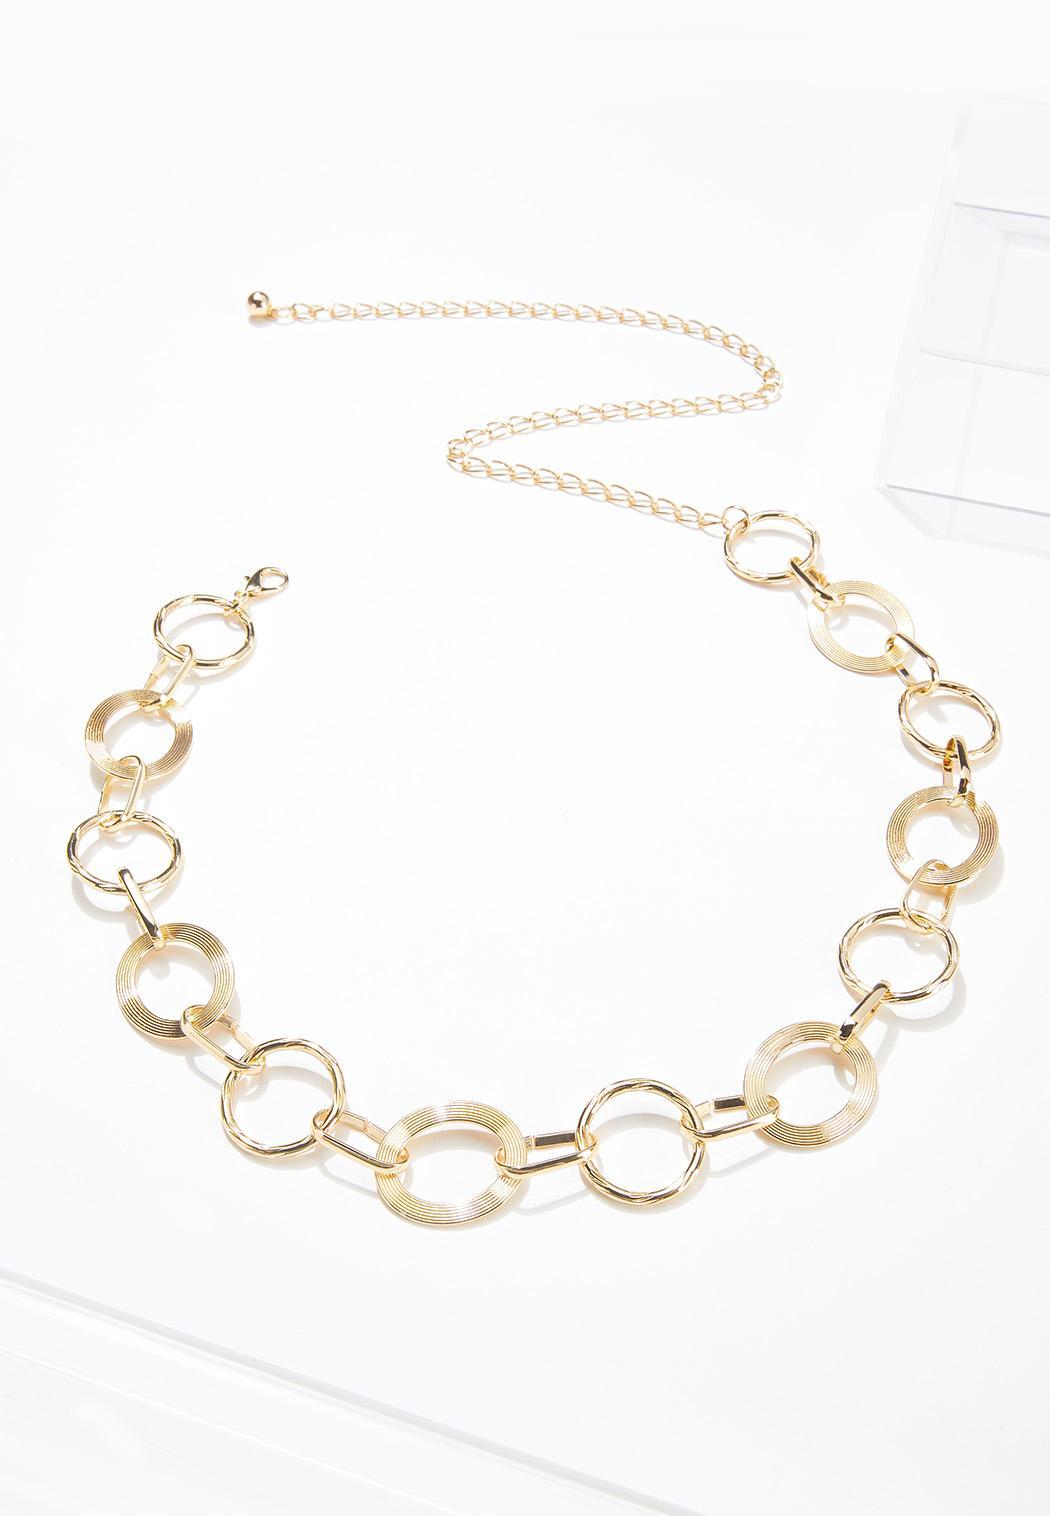 Plus Size Detailed Circle Chain Belt